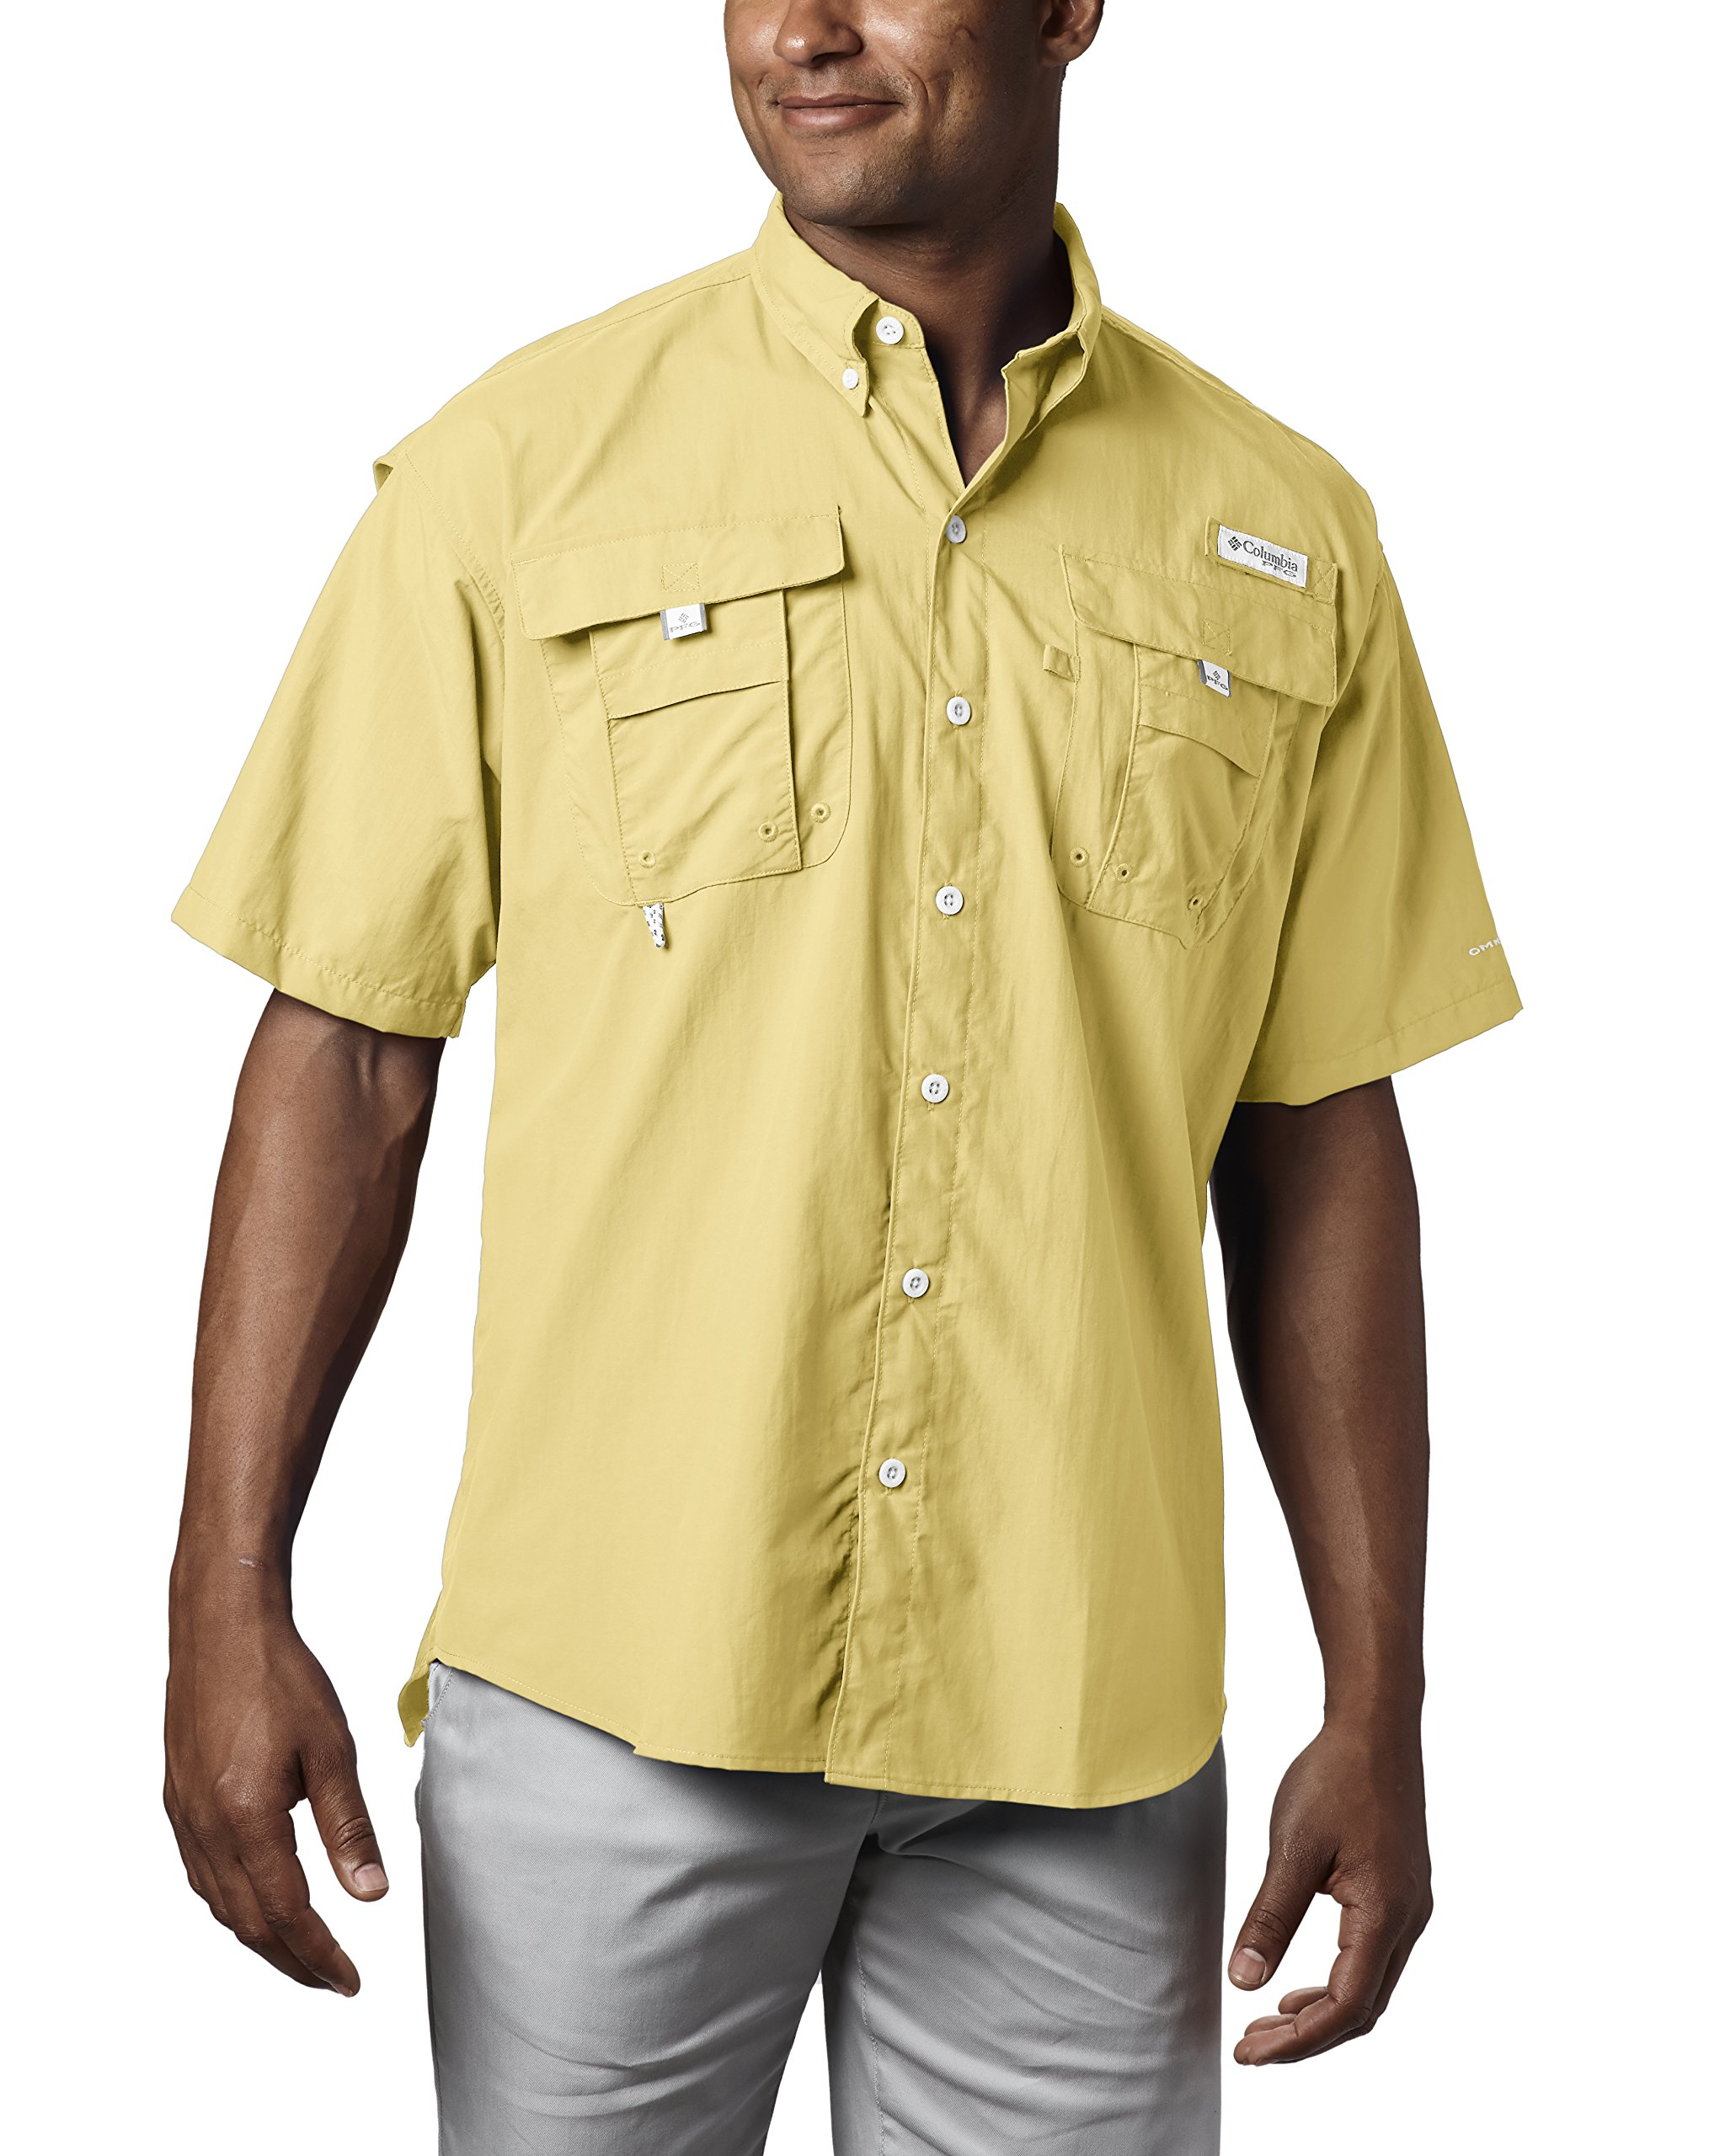 Columbia Men's Bahama II Short Sleeve Shirt, Sunlit, 3X/Tall